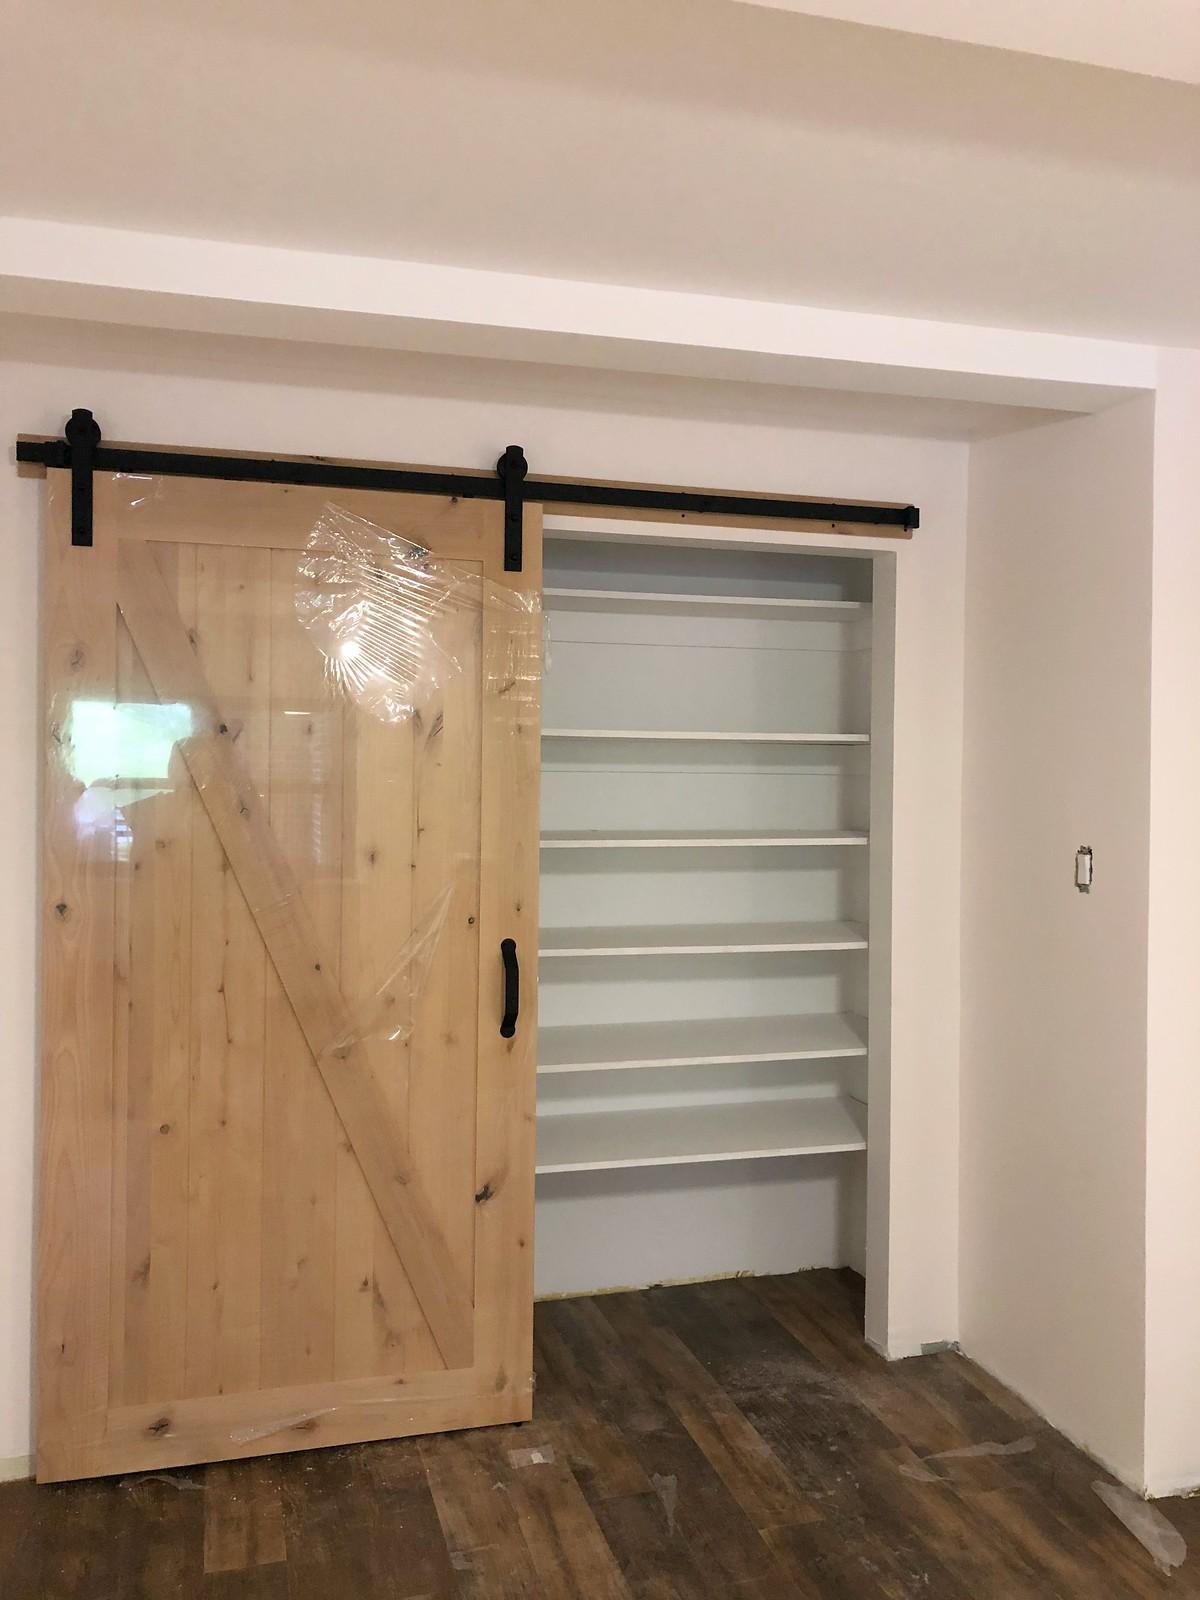 Barn Door Sliding Closet Door | Farmhouse Interior Door | During Master Bedroom Renovation Photos | Parquet Floors | New York One Bedroom Apartment Reno | Before & After: Feminine Chic Bedroom Renovation